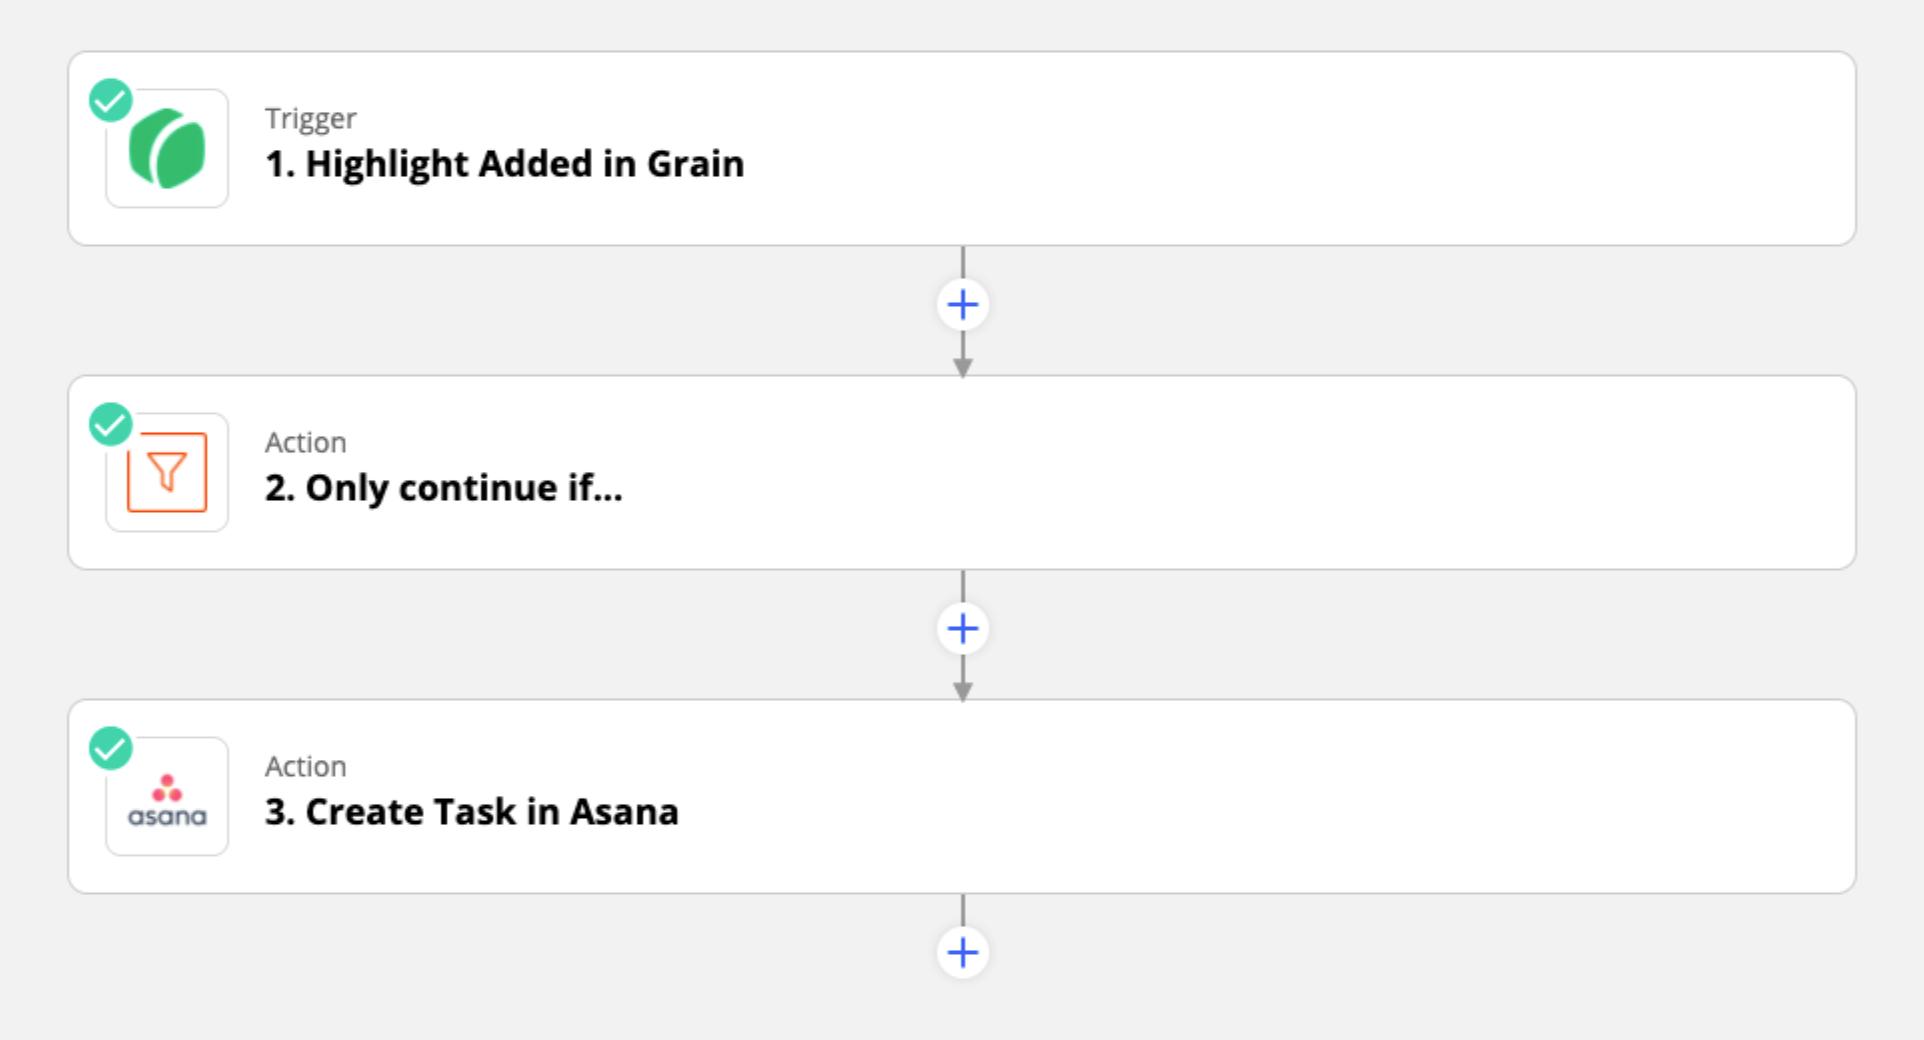 Grain to Asana